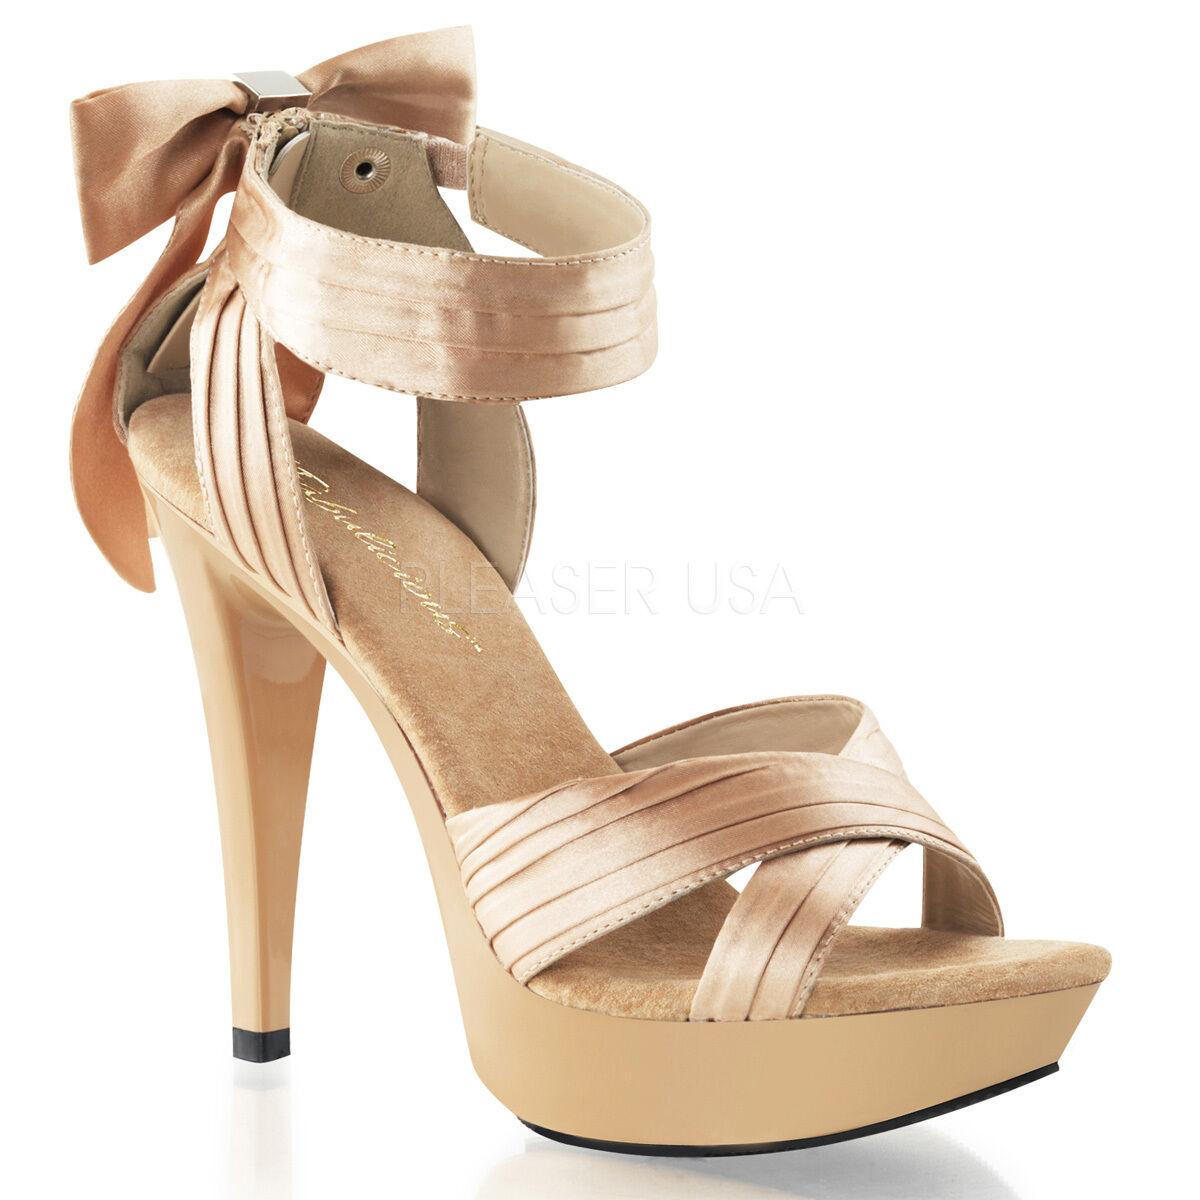 Nude Cream Satin Pinup Girl Heels Bows Wedding Bridesmaid Bridal Shoes Womans